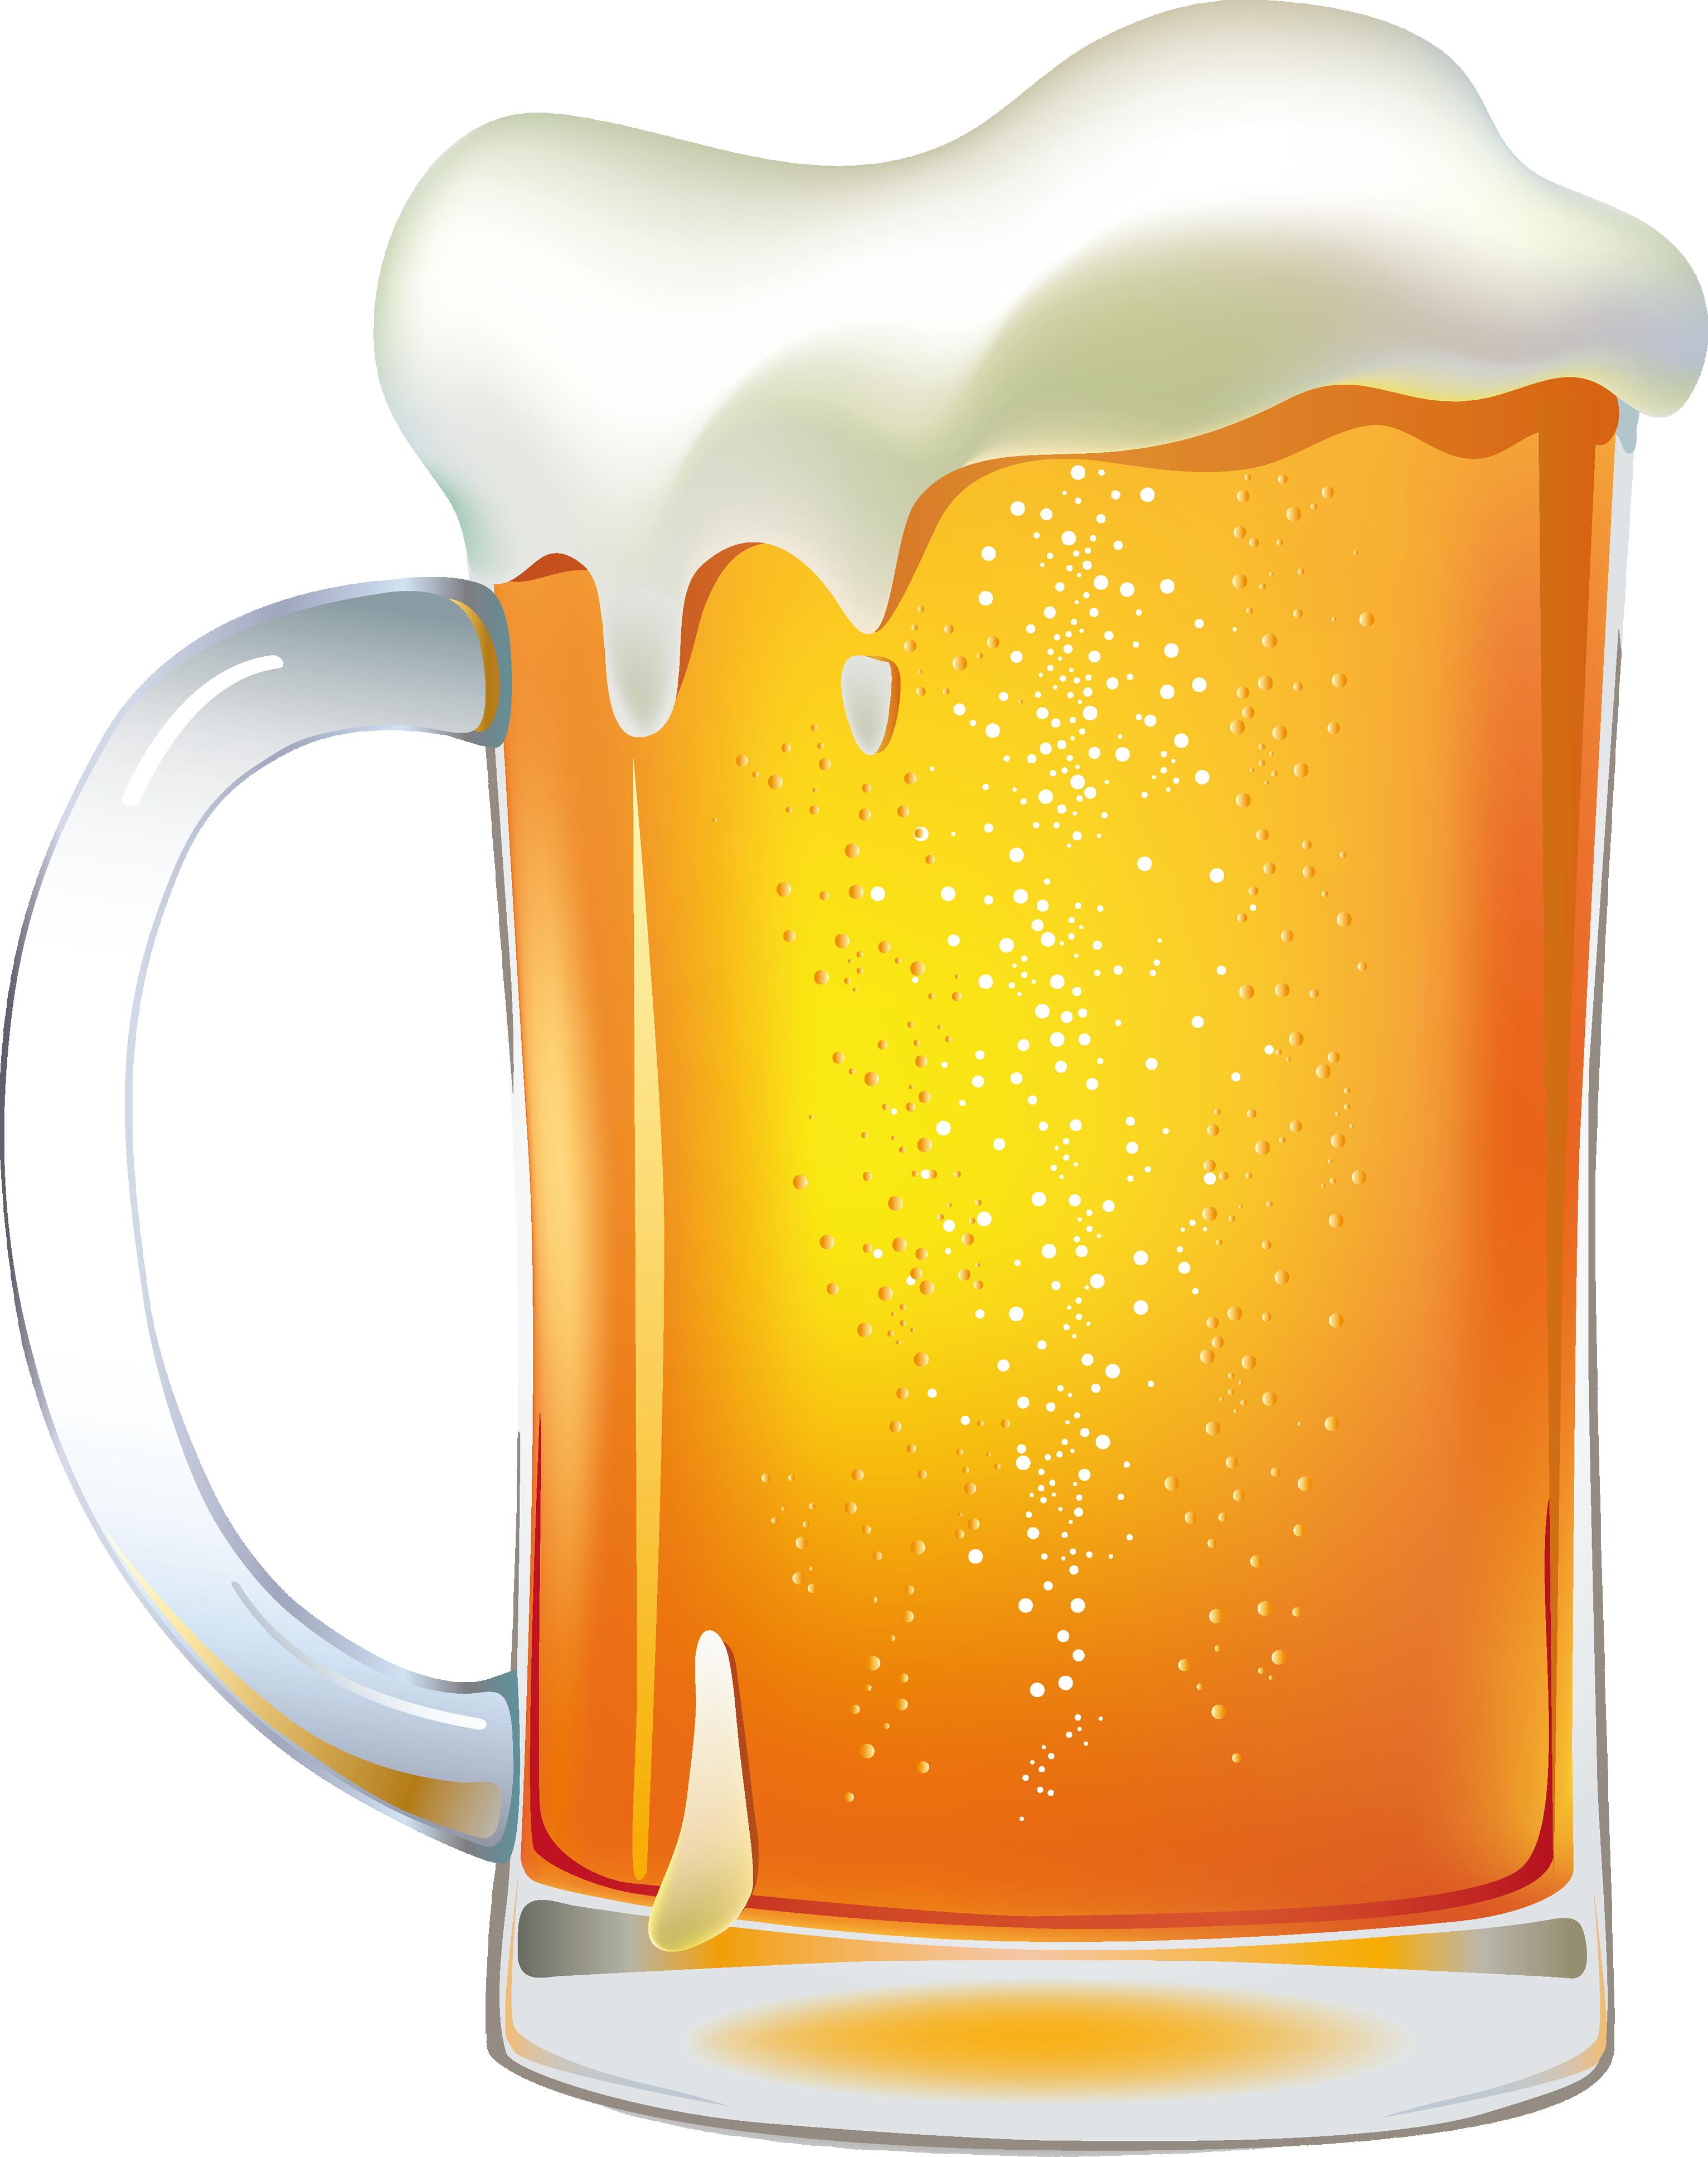 beer clip art free download clipart panda free clipart